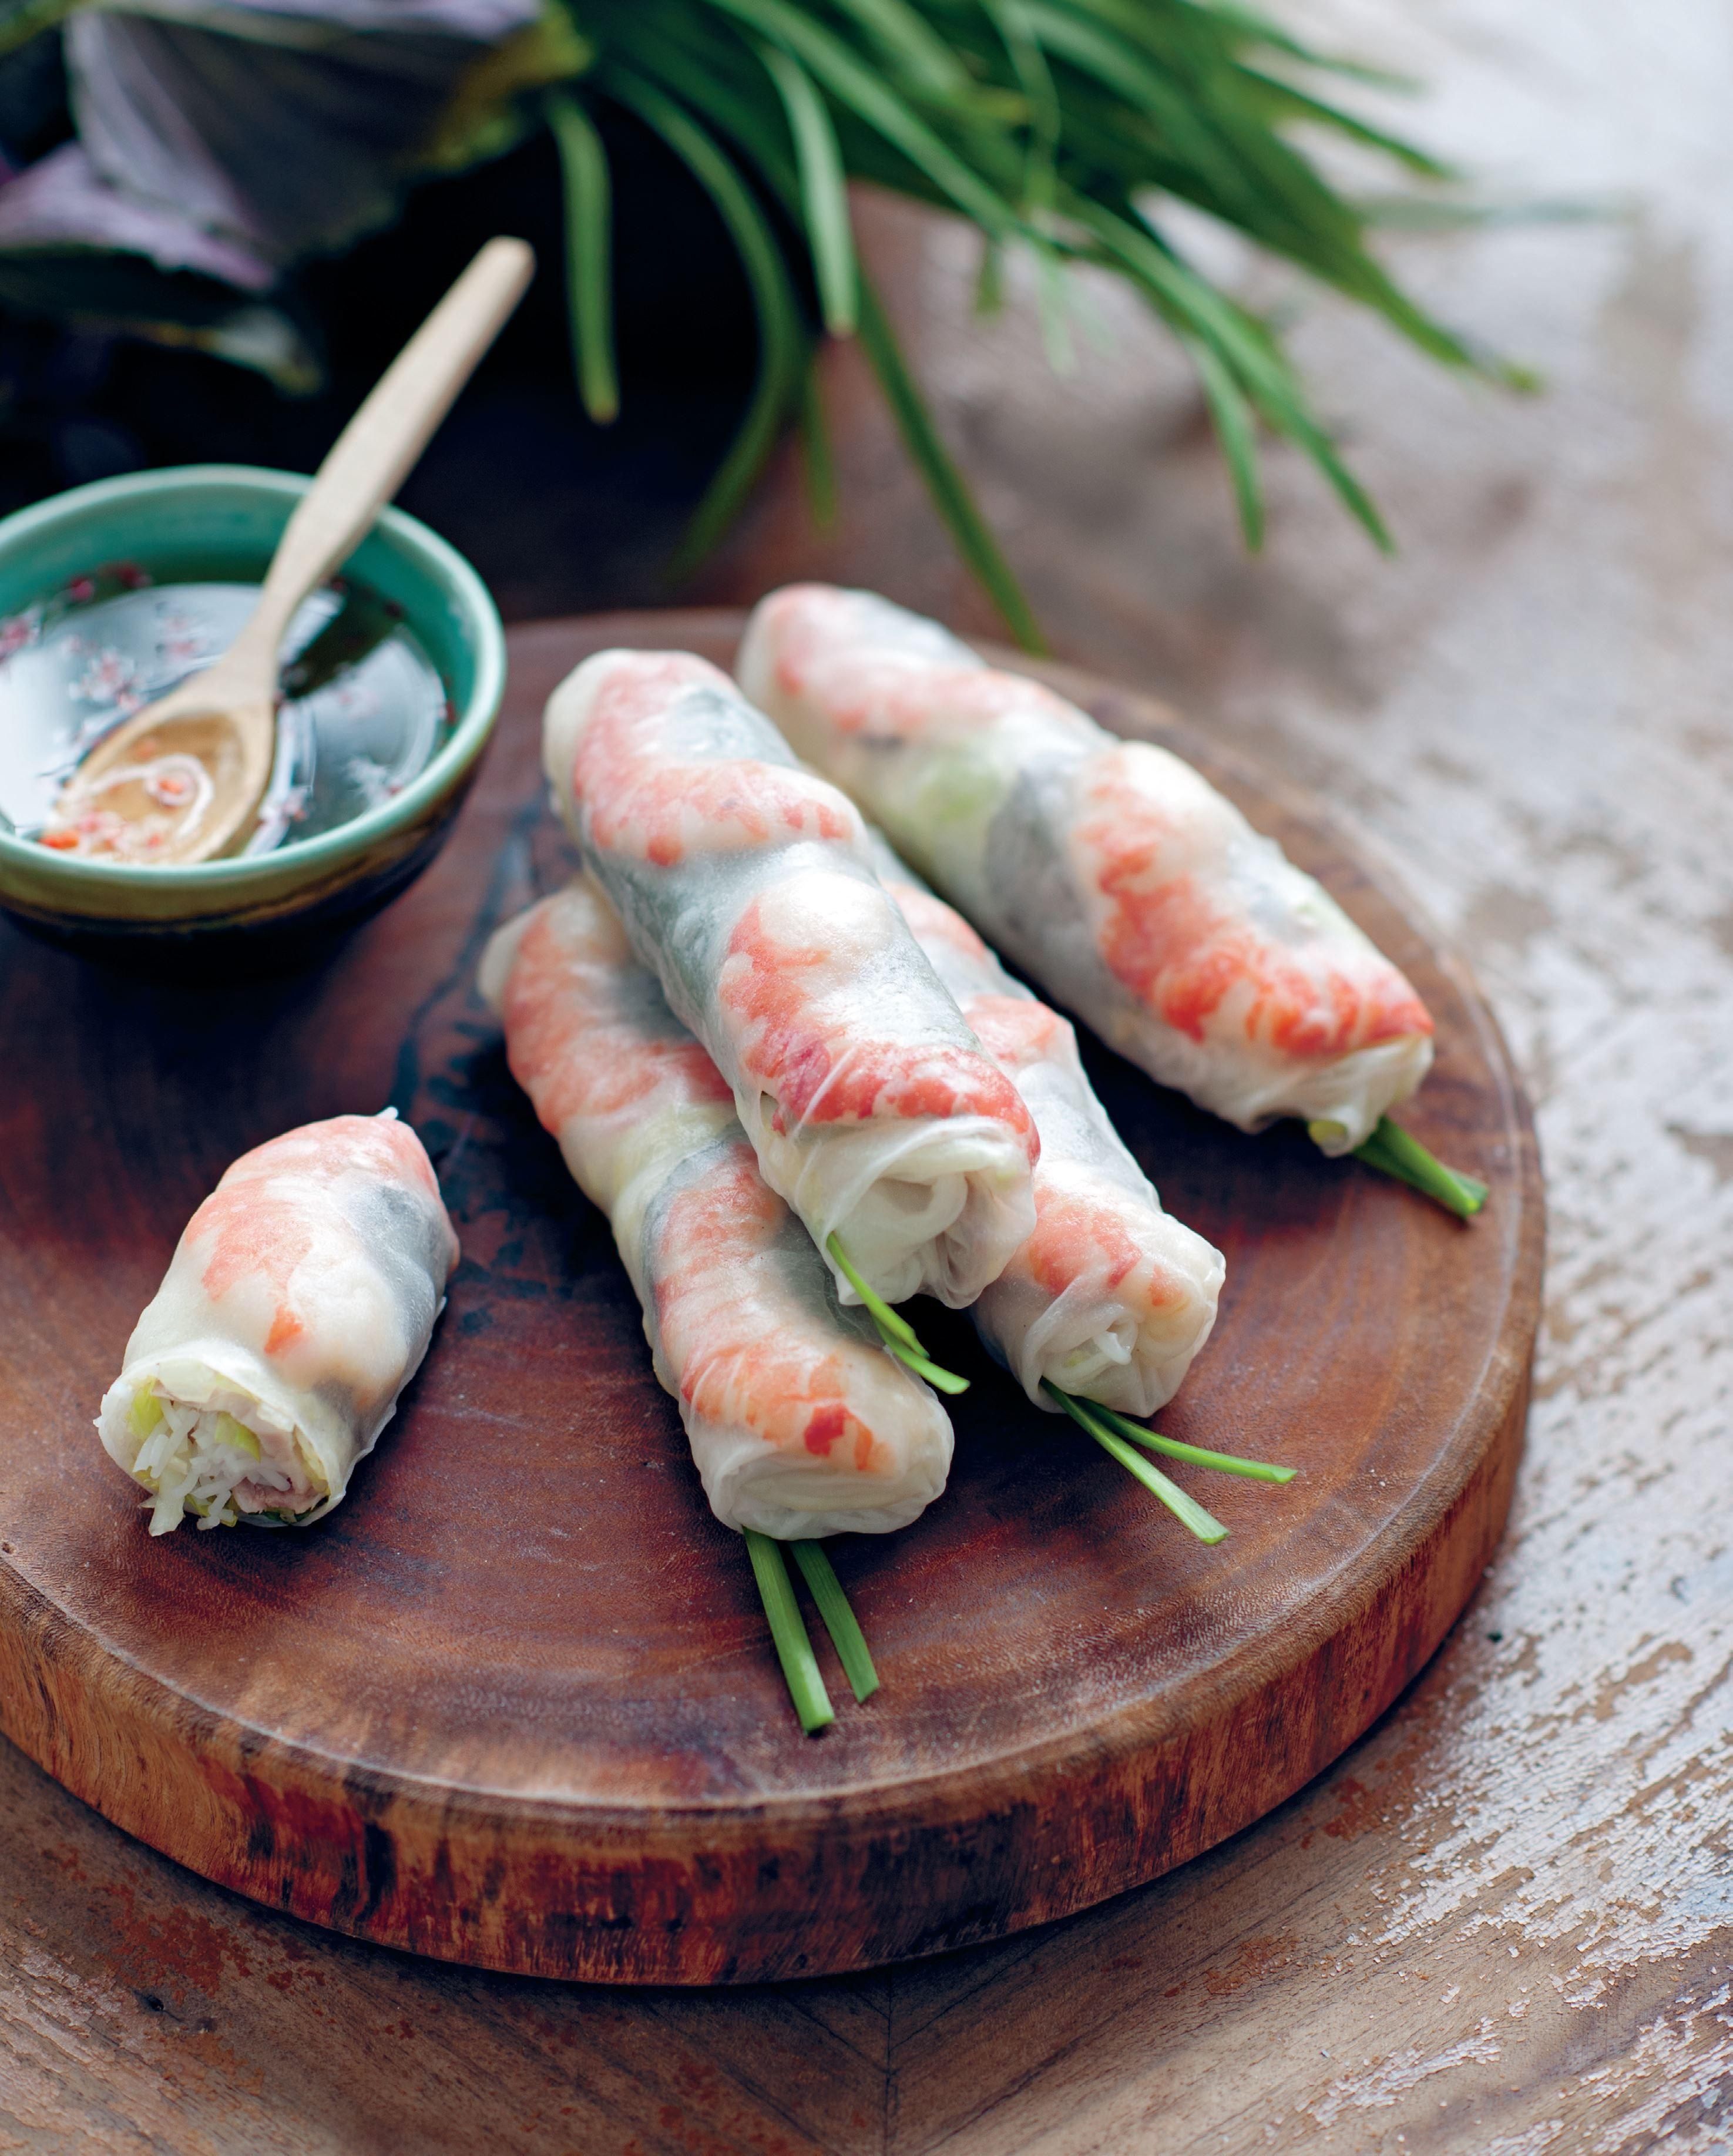 Luke Nguyen's Soft Rice Paper Rolls With Prawns